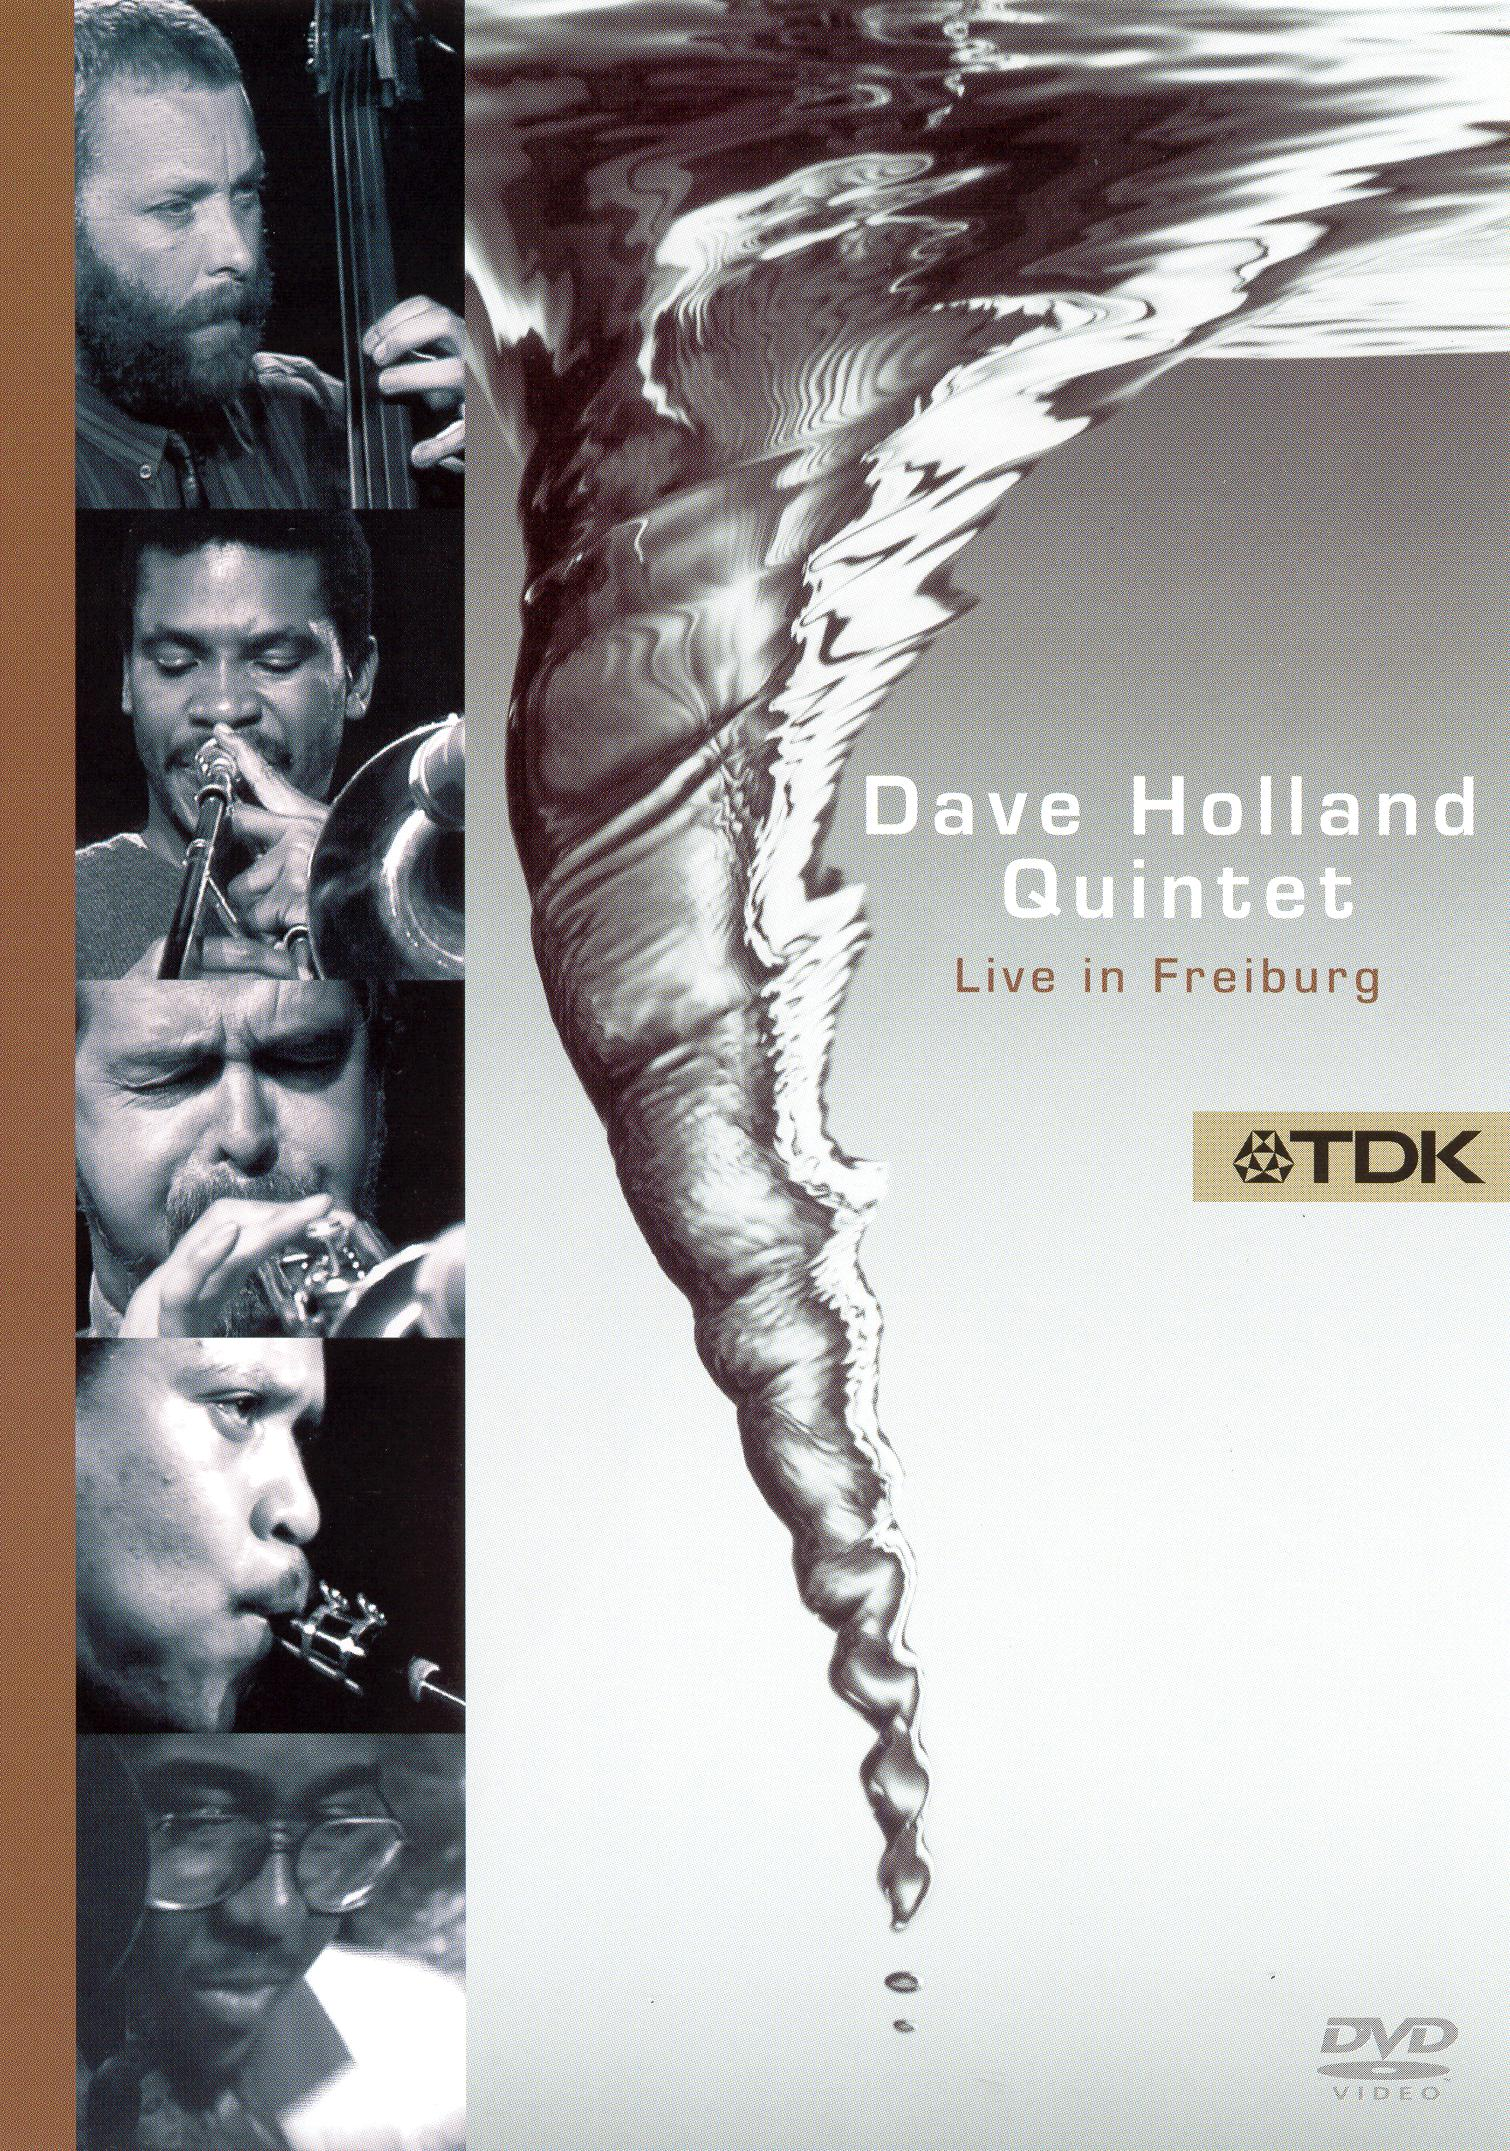 Dave Holland Quintet: Live in Freiburg